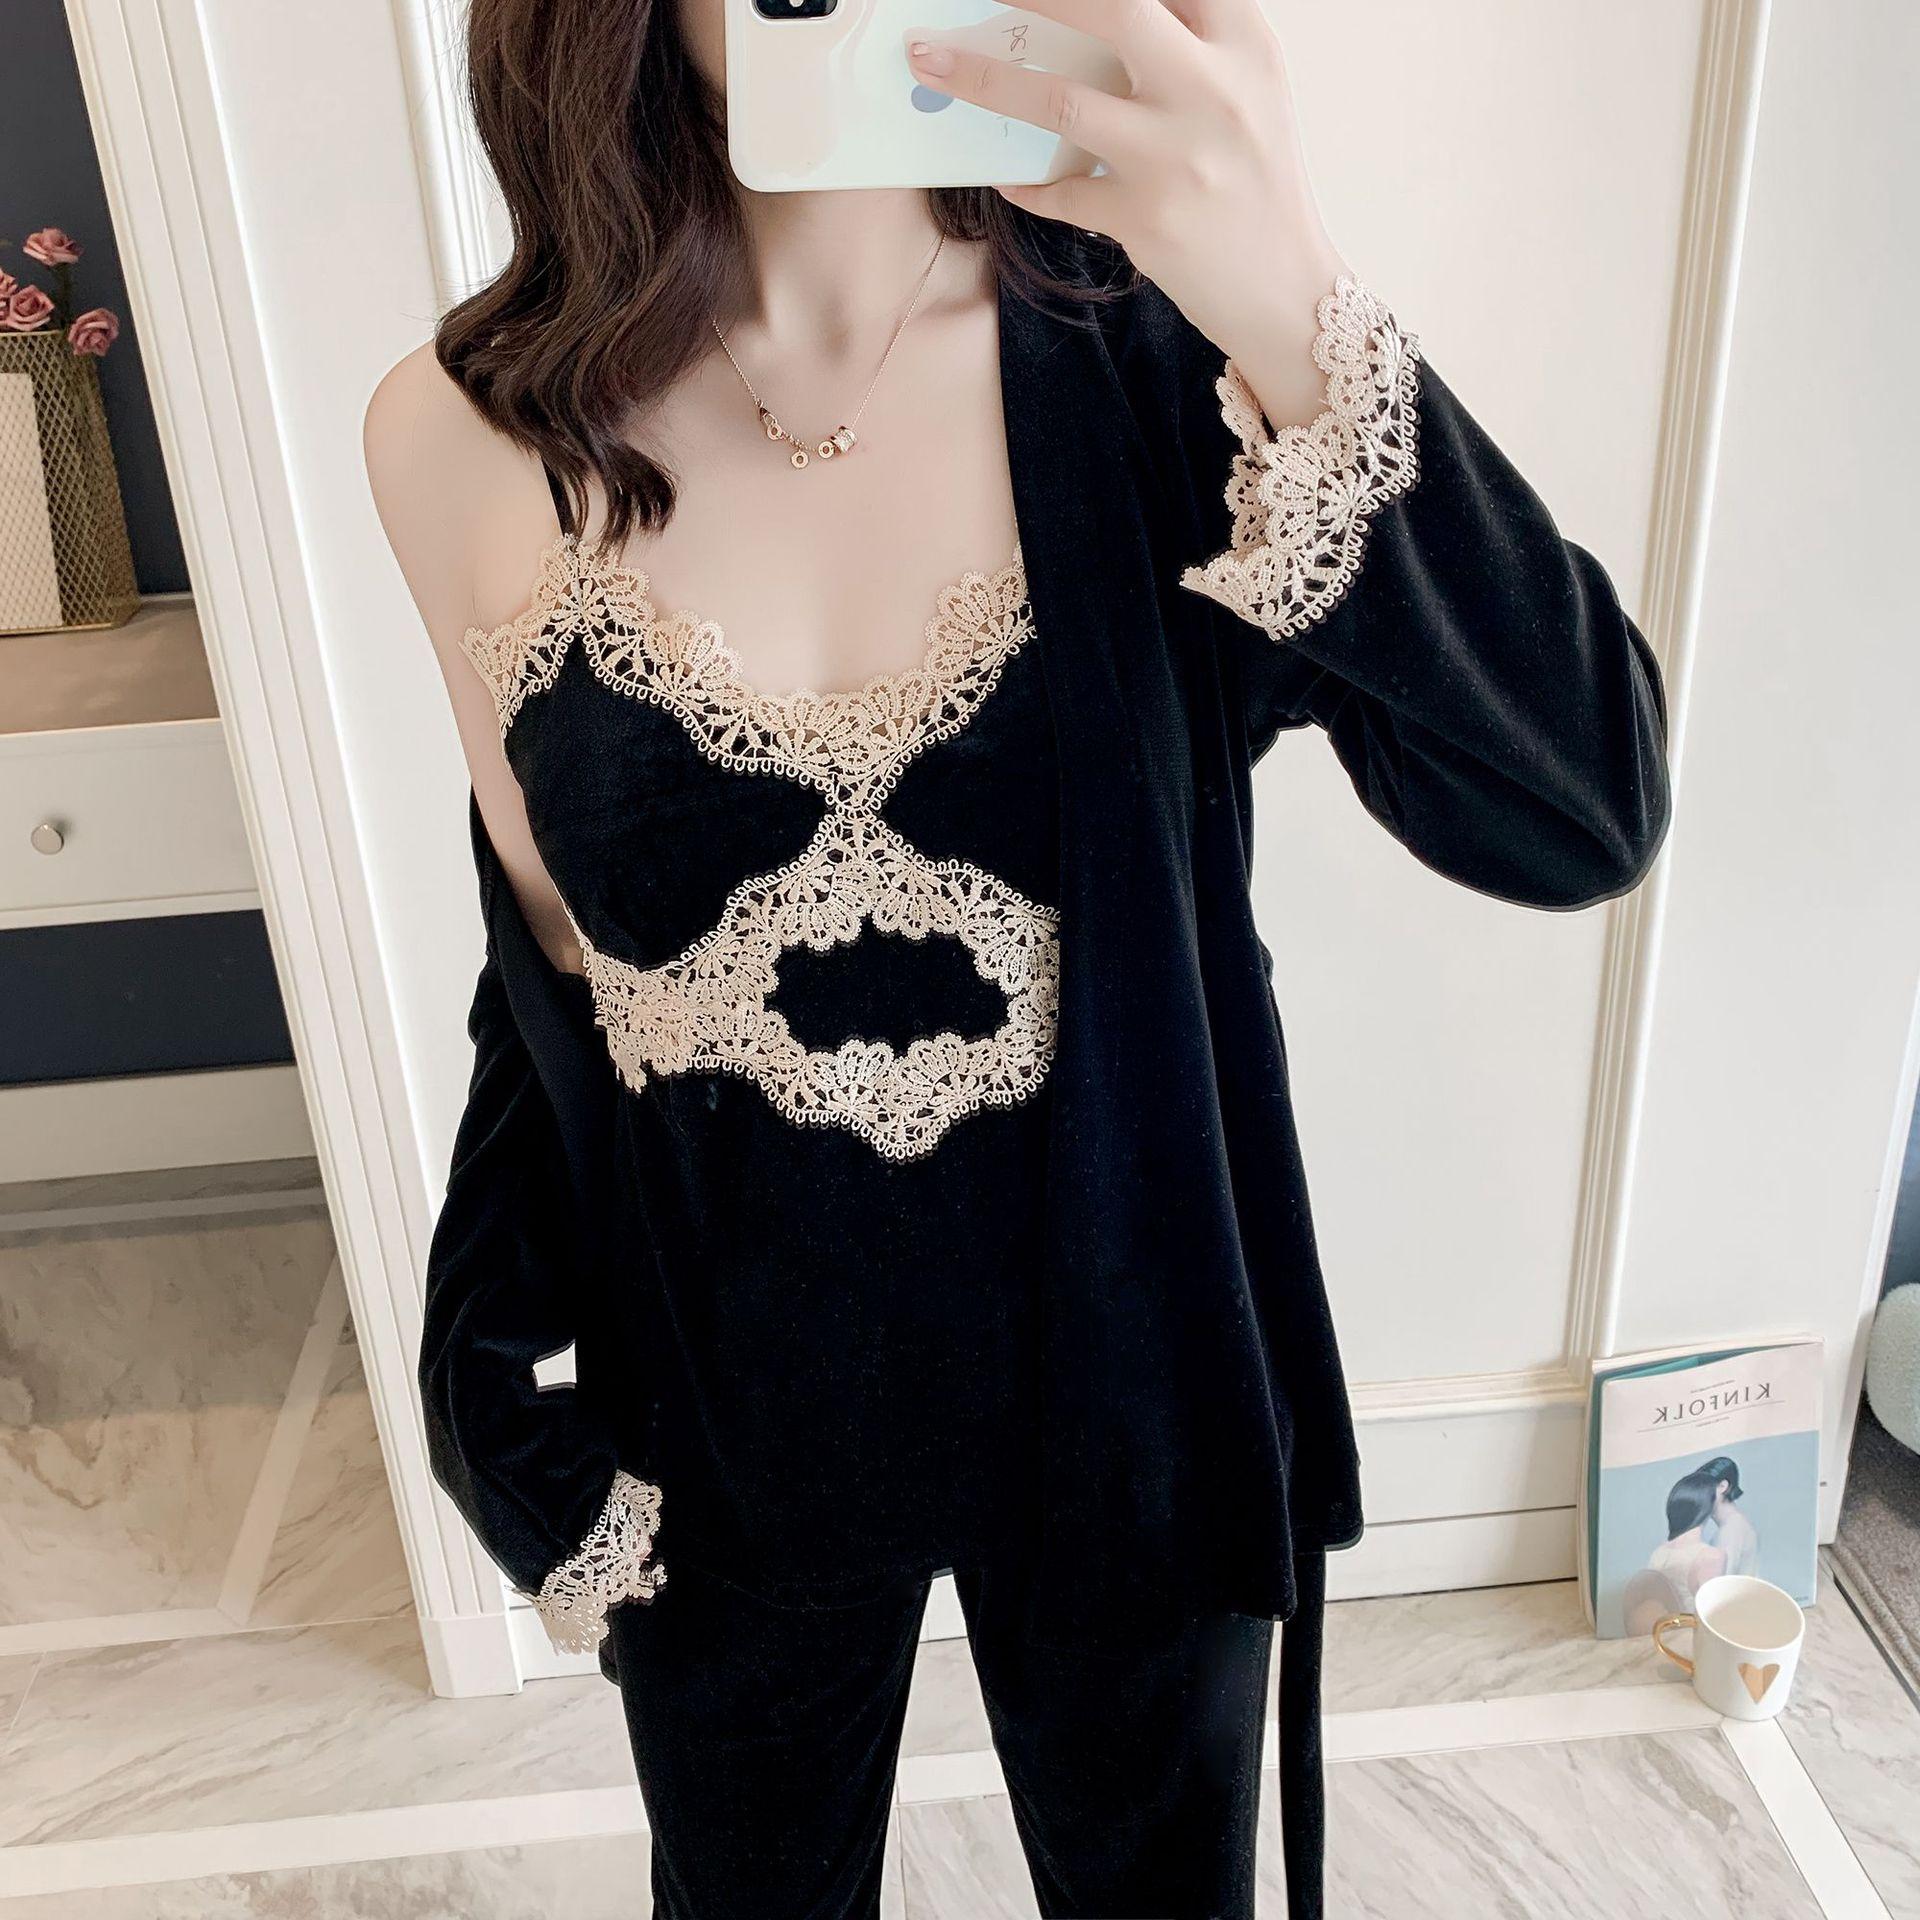 2020 New Women Velvet Pajamas Set Robe&Pant Pyjama Suit Autumn Velour 2PCS Sleepwear Sexy Lace Nightwear Bath Robe Gown M-XL